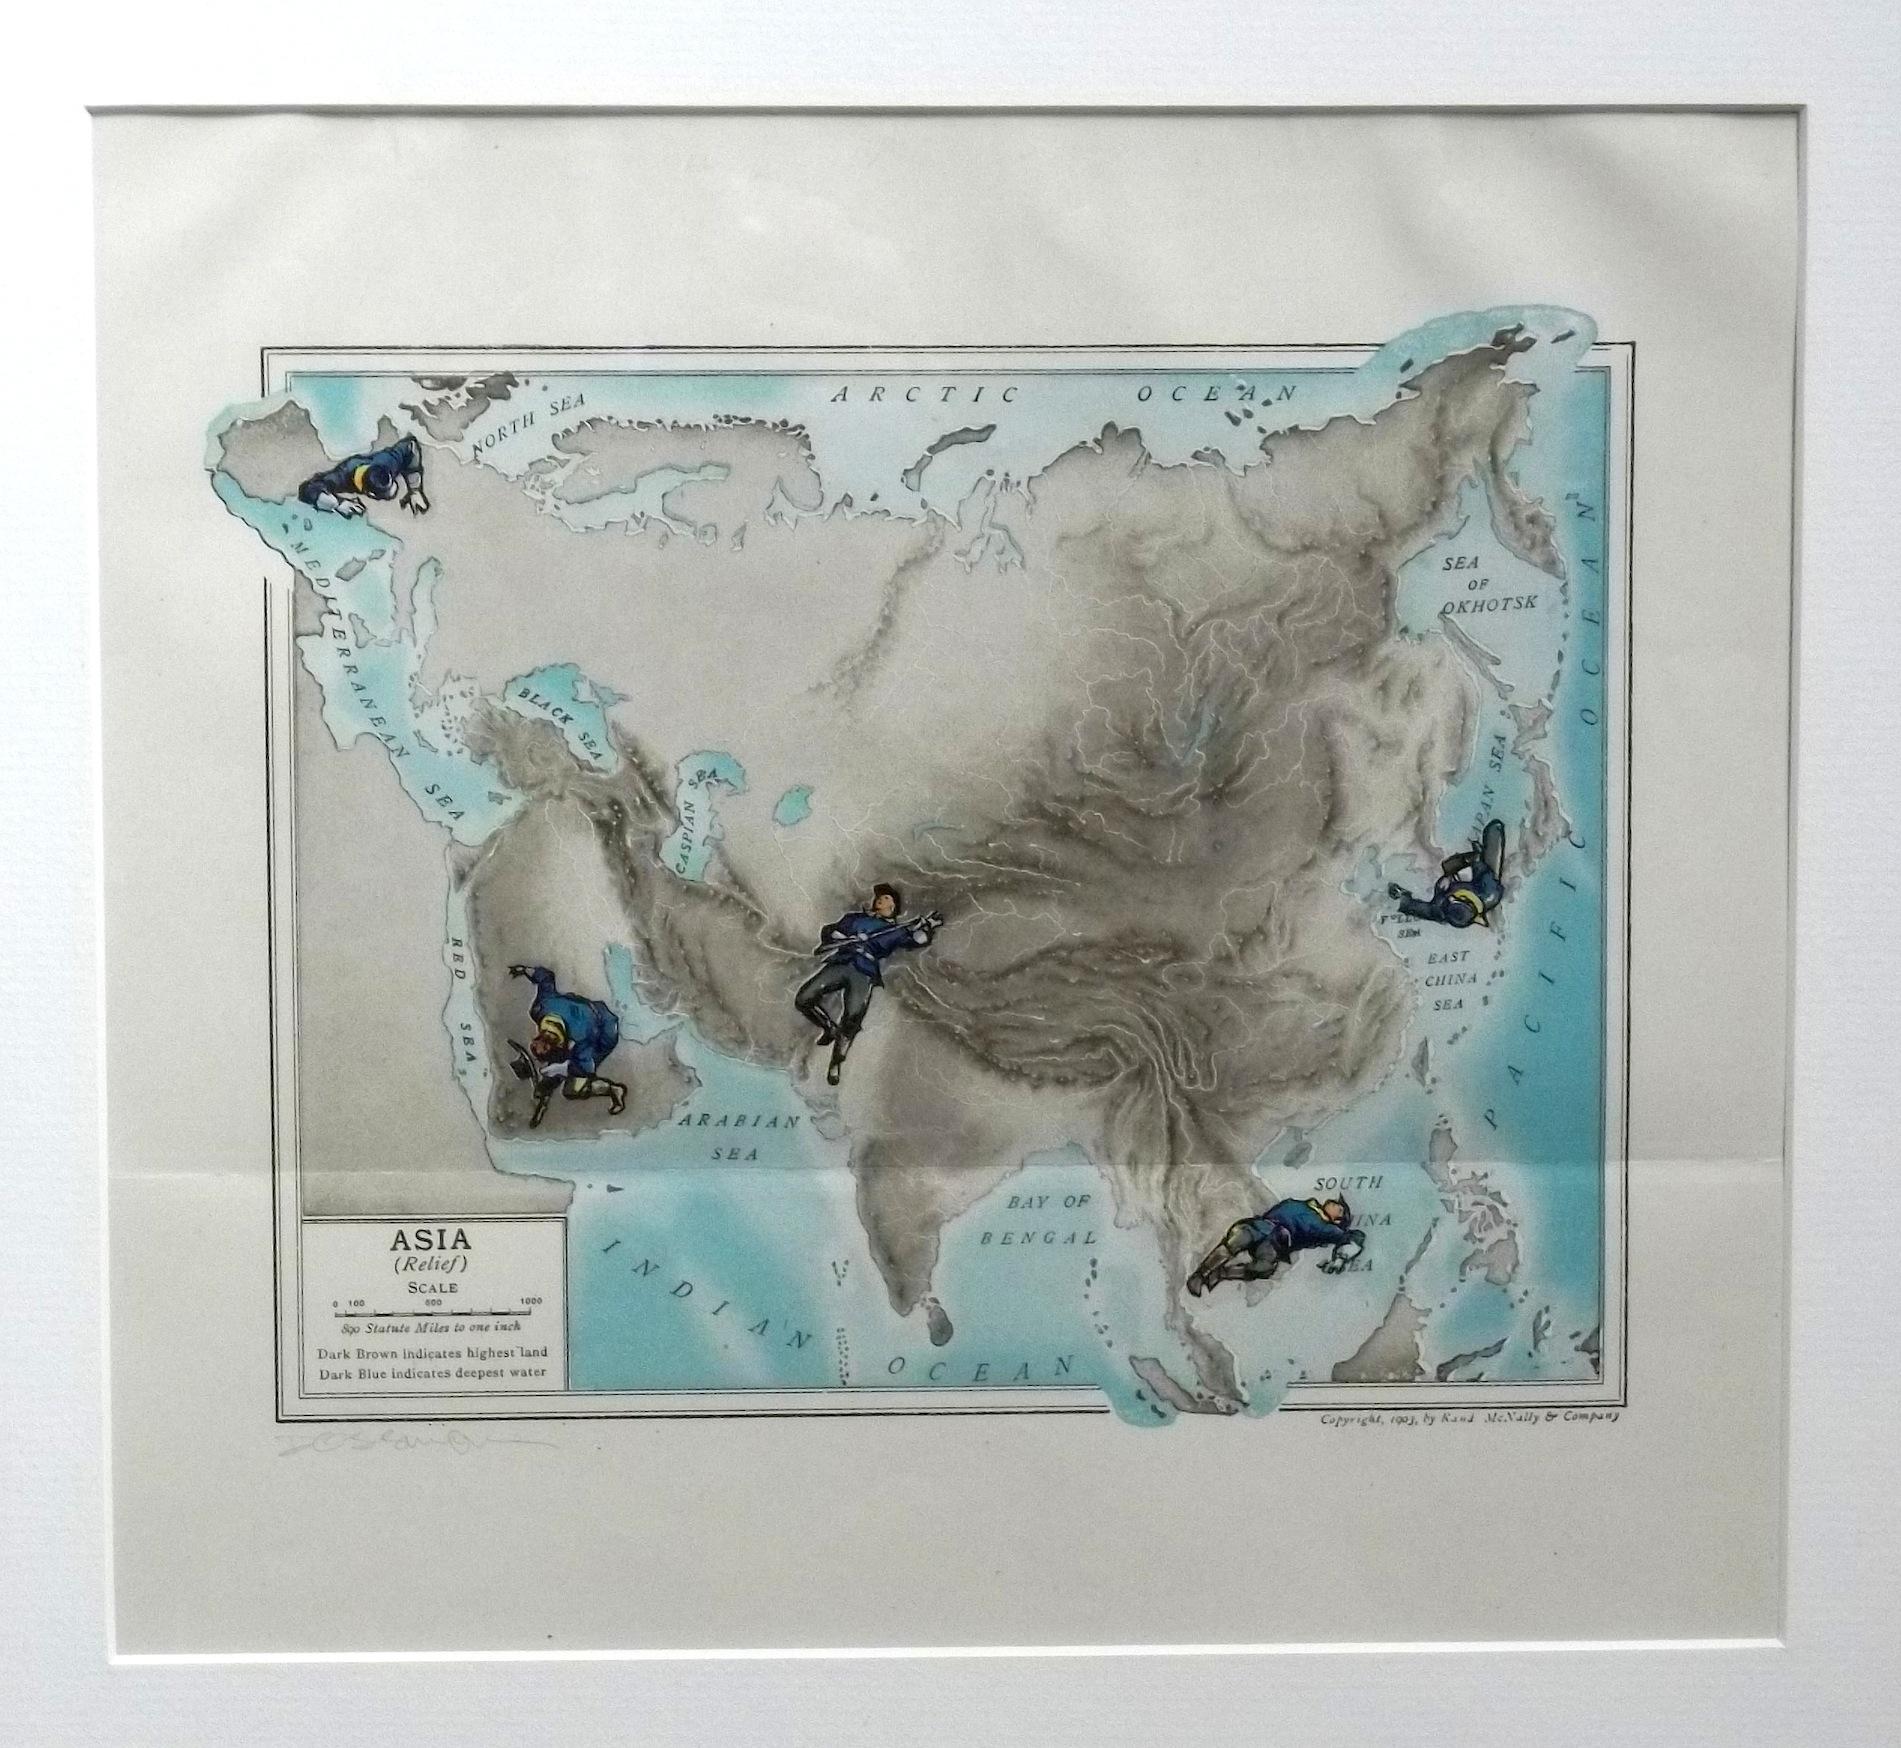 "Asia (no relief)  vintage map, transfer figures 8 x 10"" framed $350"